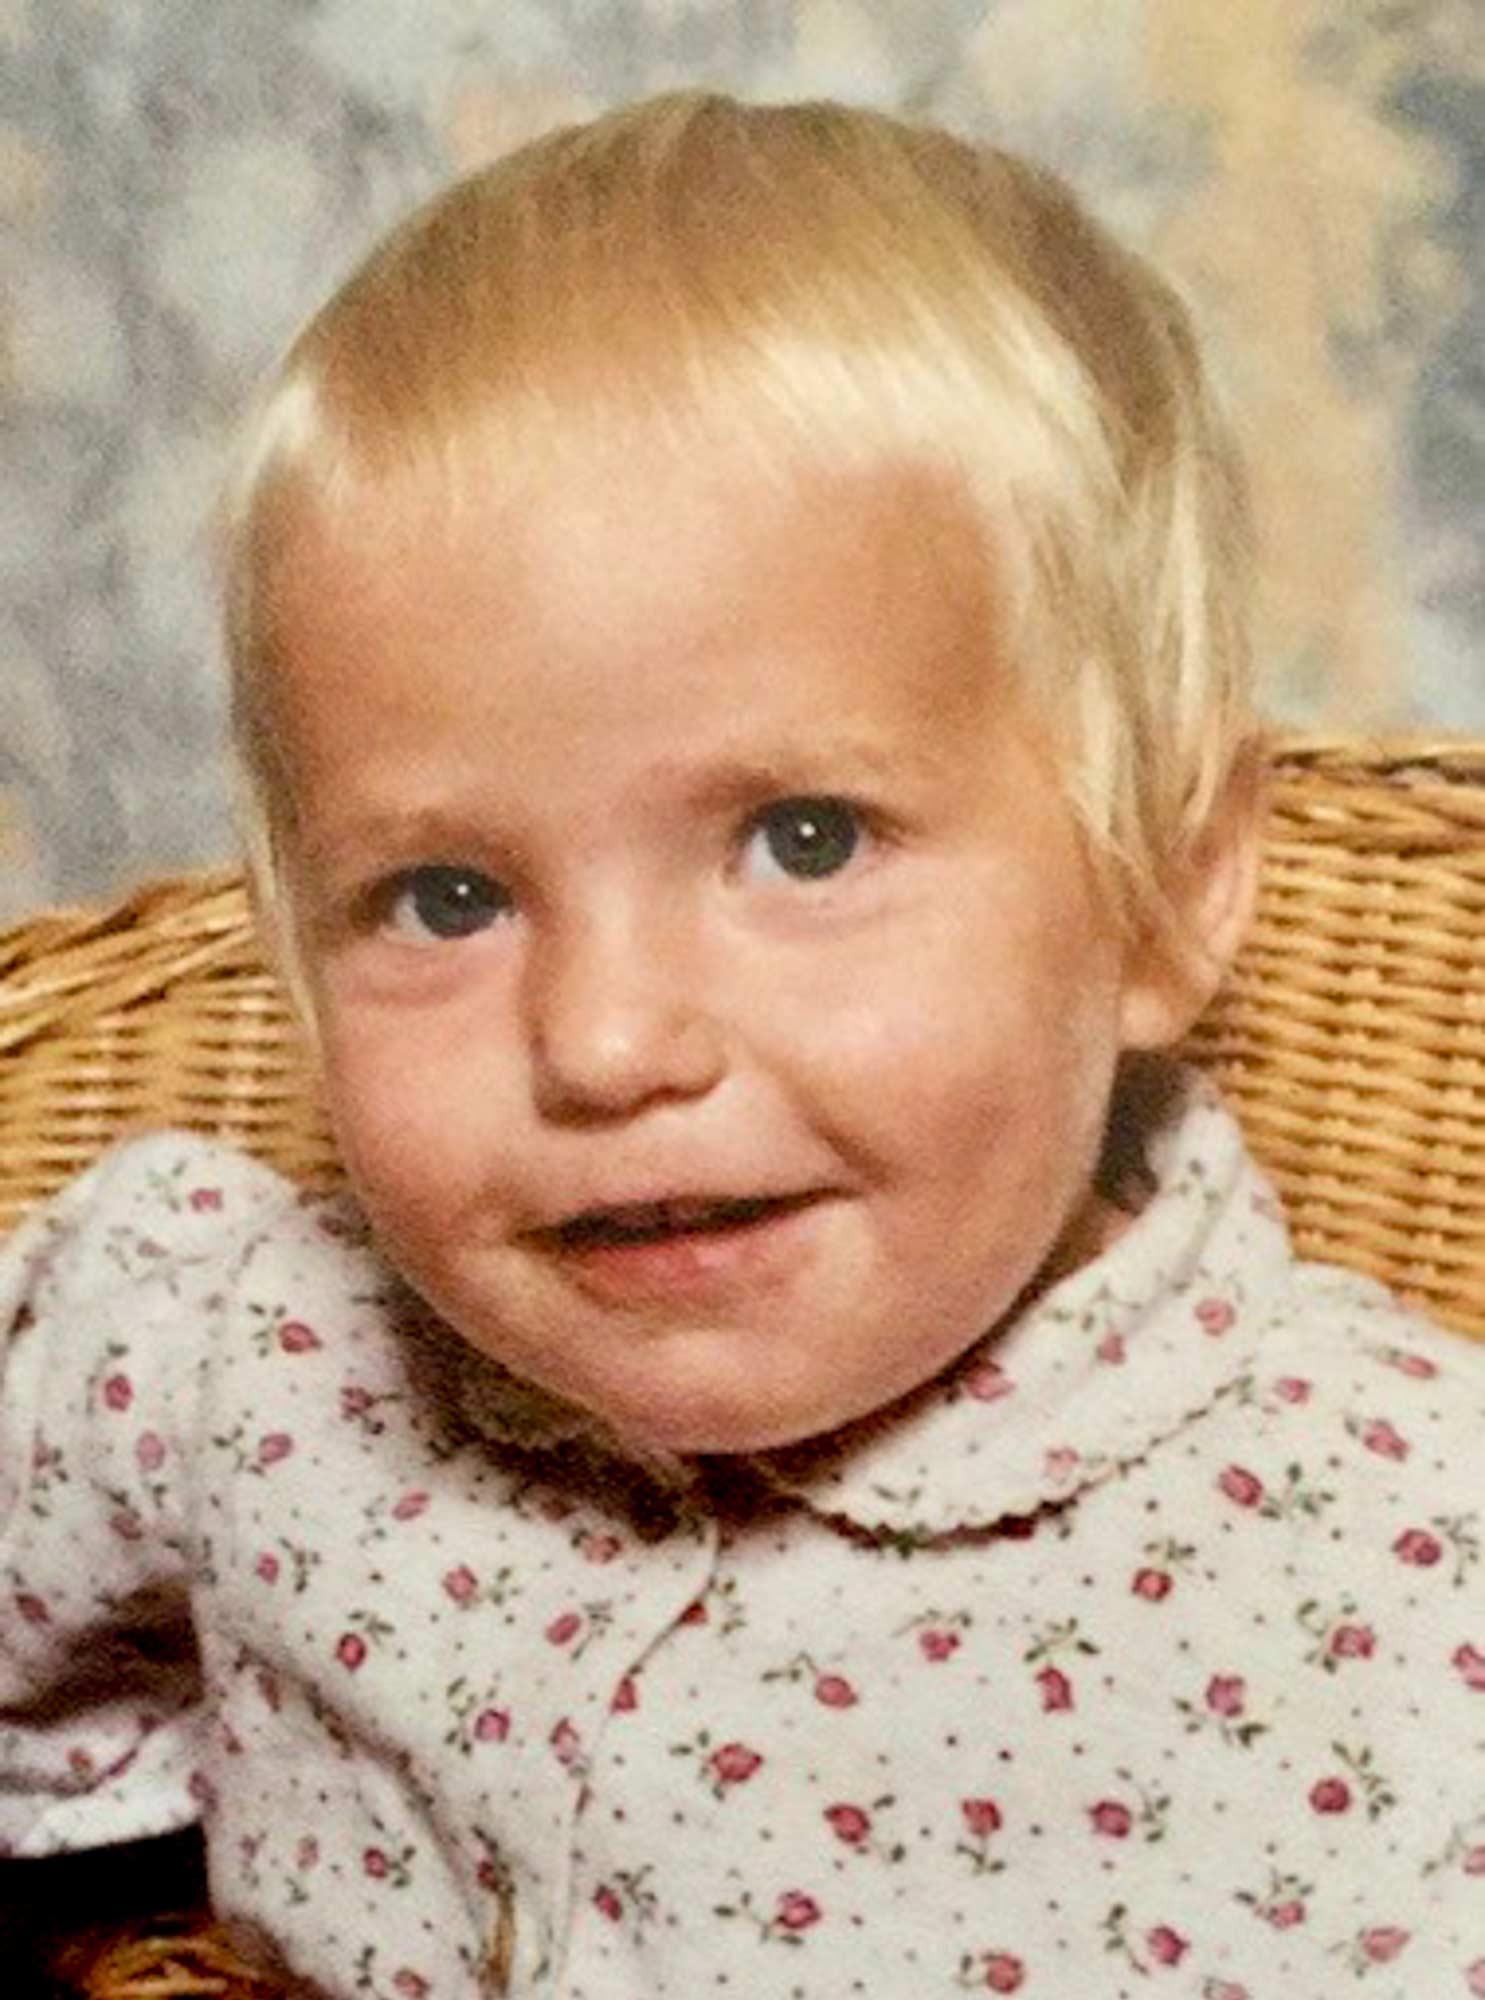 Chloe Swan baby photo